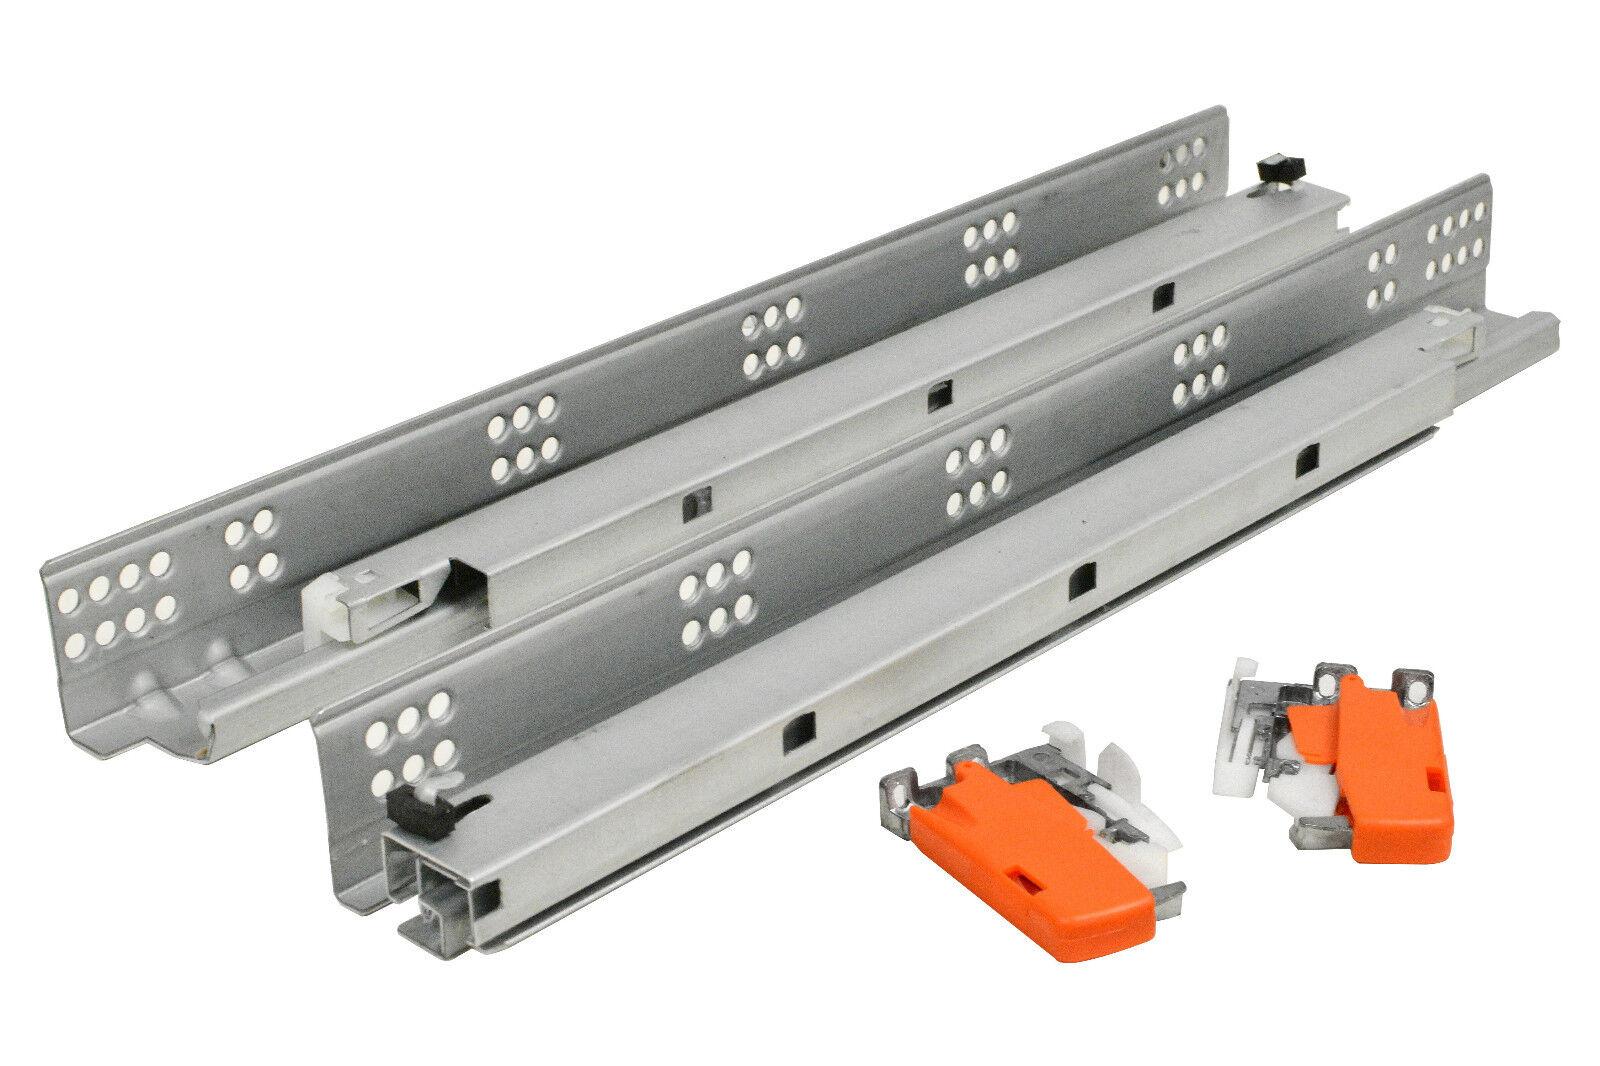 Undermount Drawer Slide 75 lb Soft Closing Full Tandem 2 Zinc Triggers 6 Pair